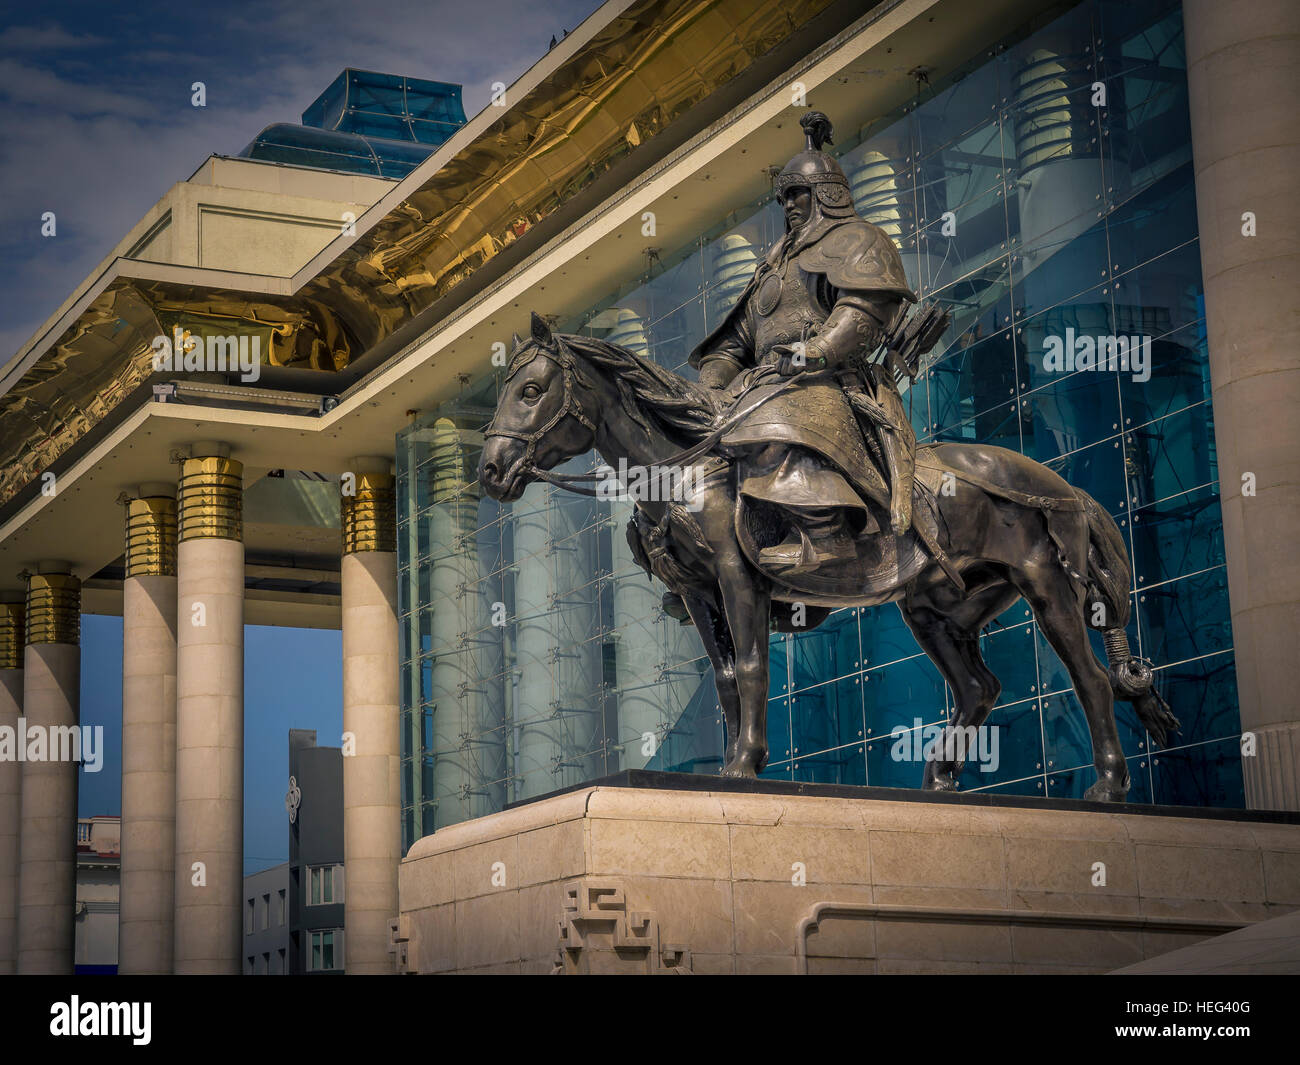 Government Palace, statue, Chinggis Square, Ulaanbaatar, Mongolia - Stock Image